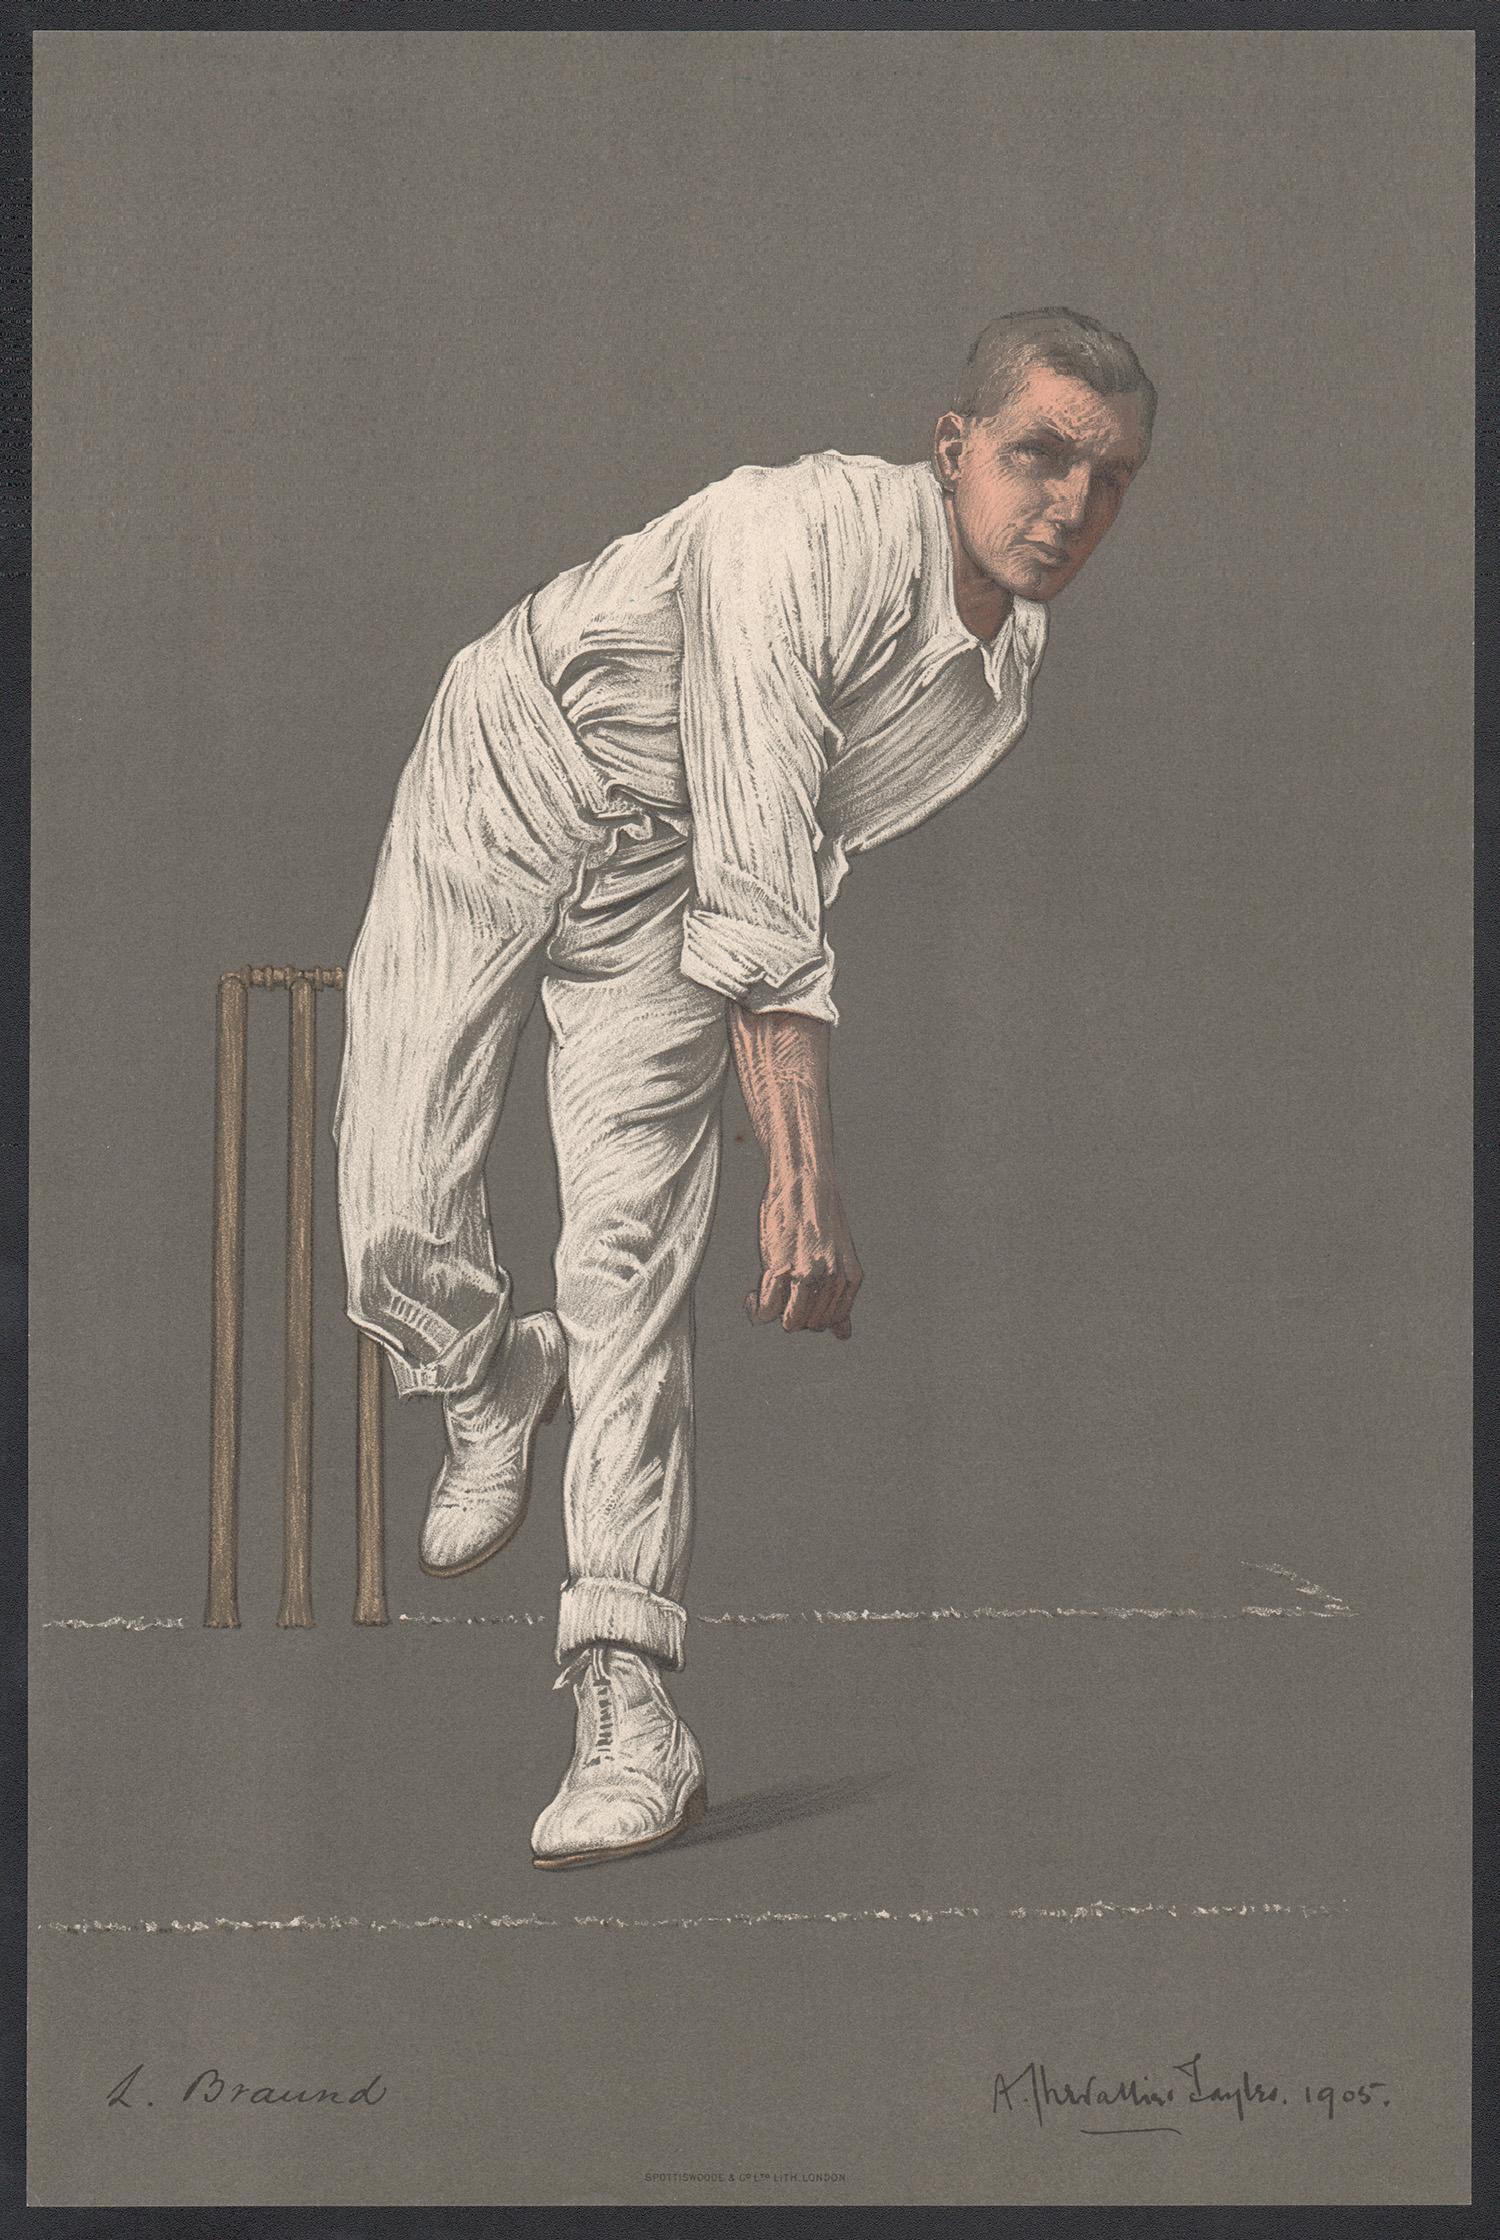 Leonard Braund, Empire Cricketeer, English cricket portrait lithograph, 1905